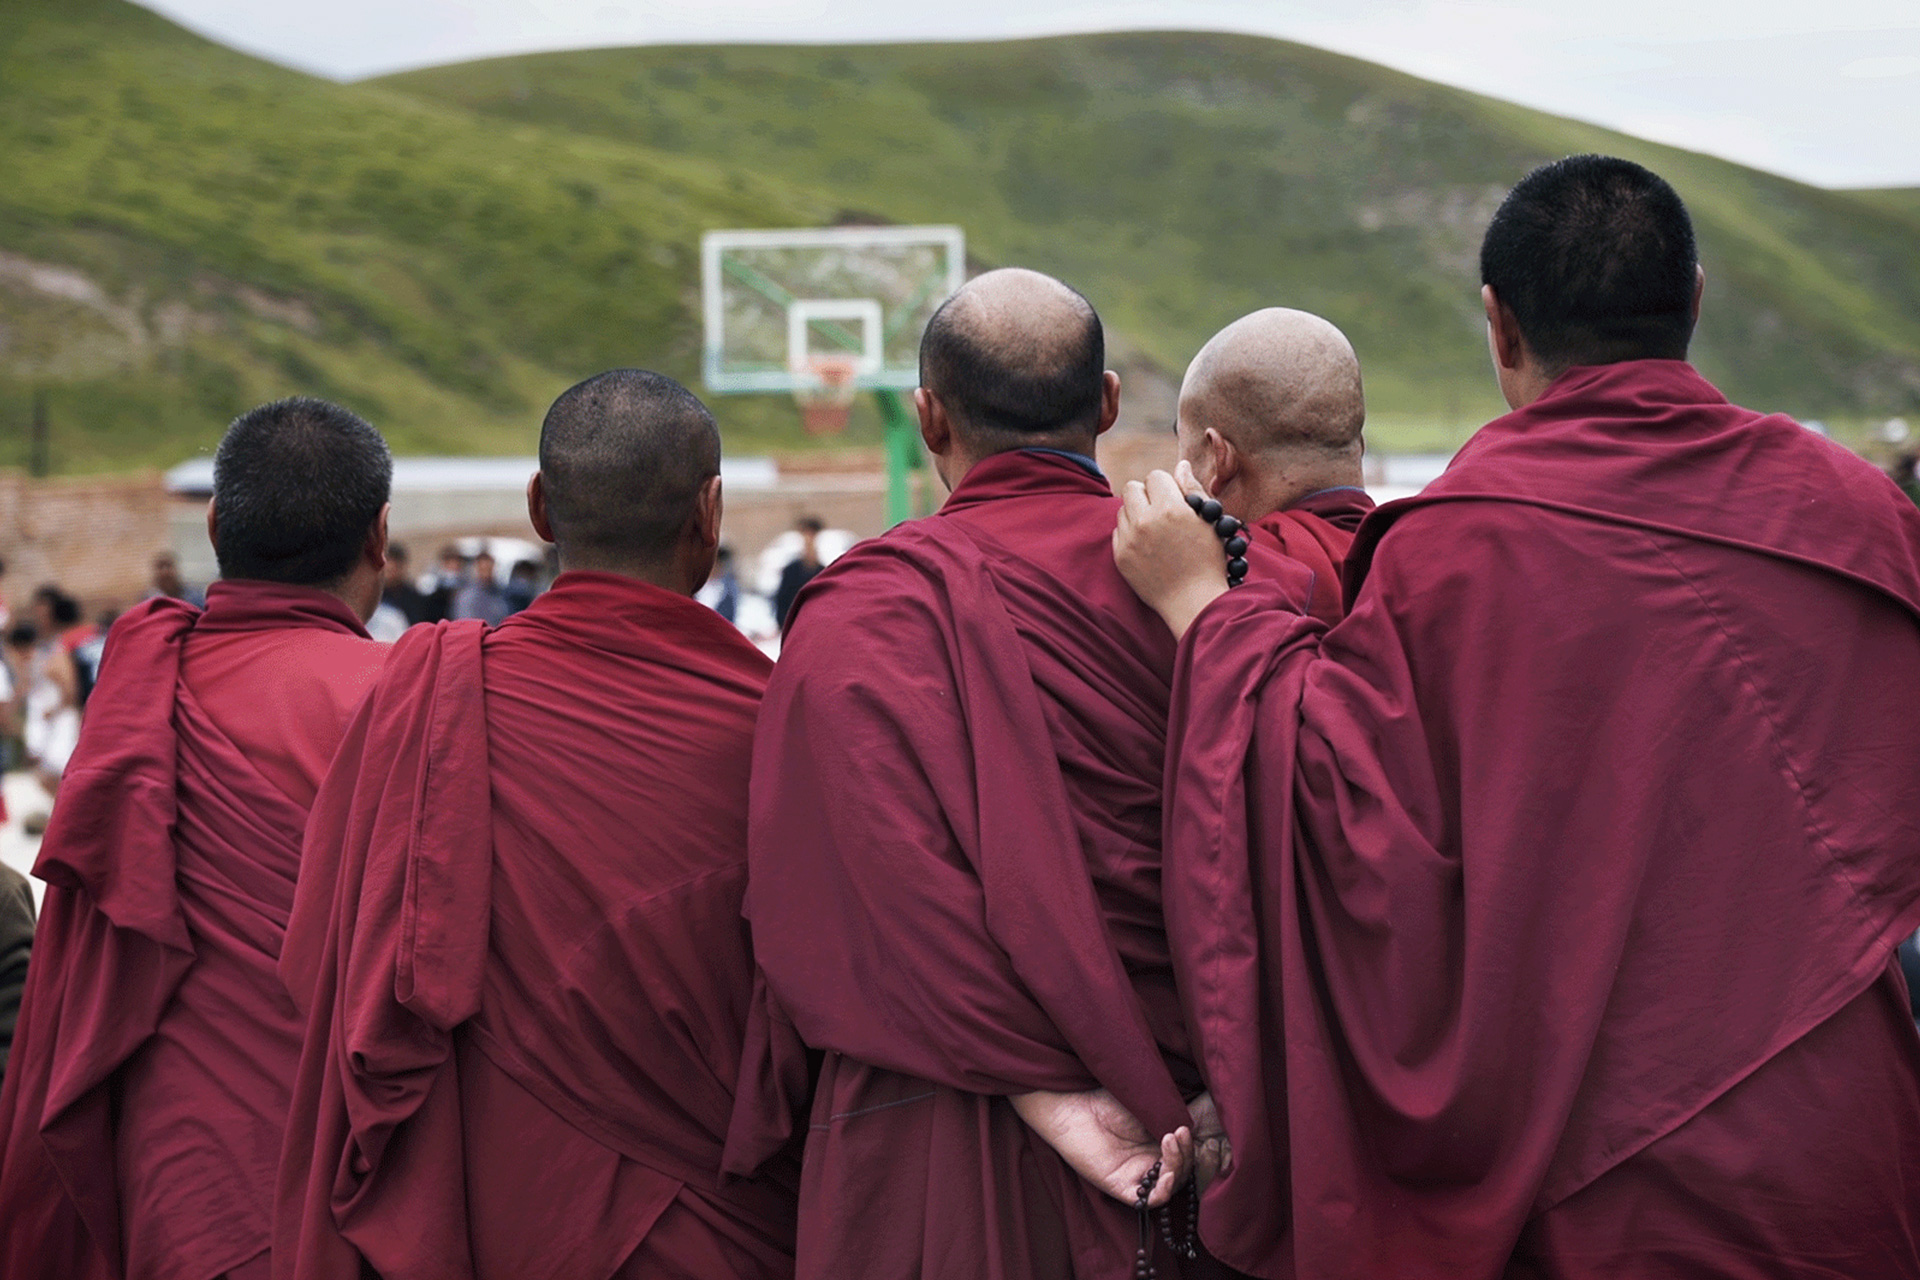 Monks watching BB game gallery_10.jpg